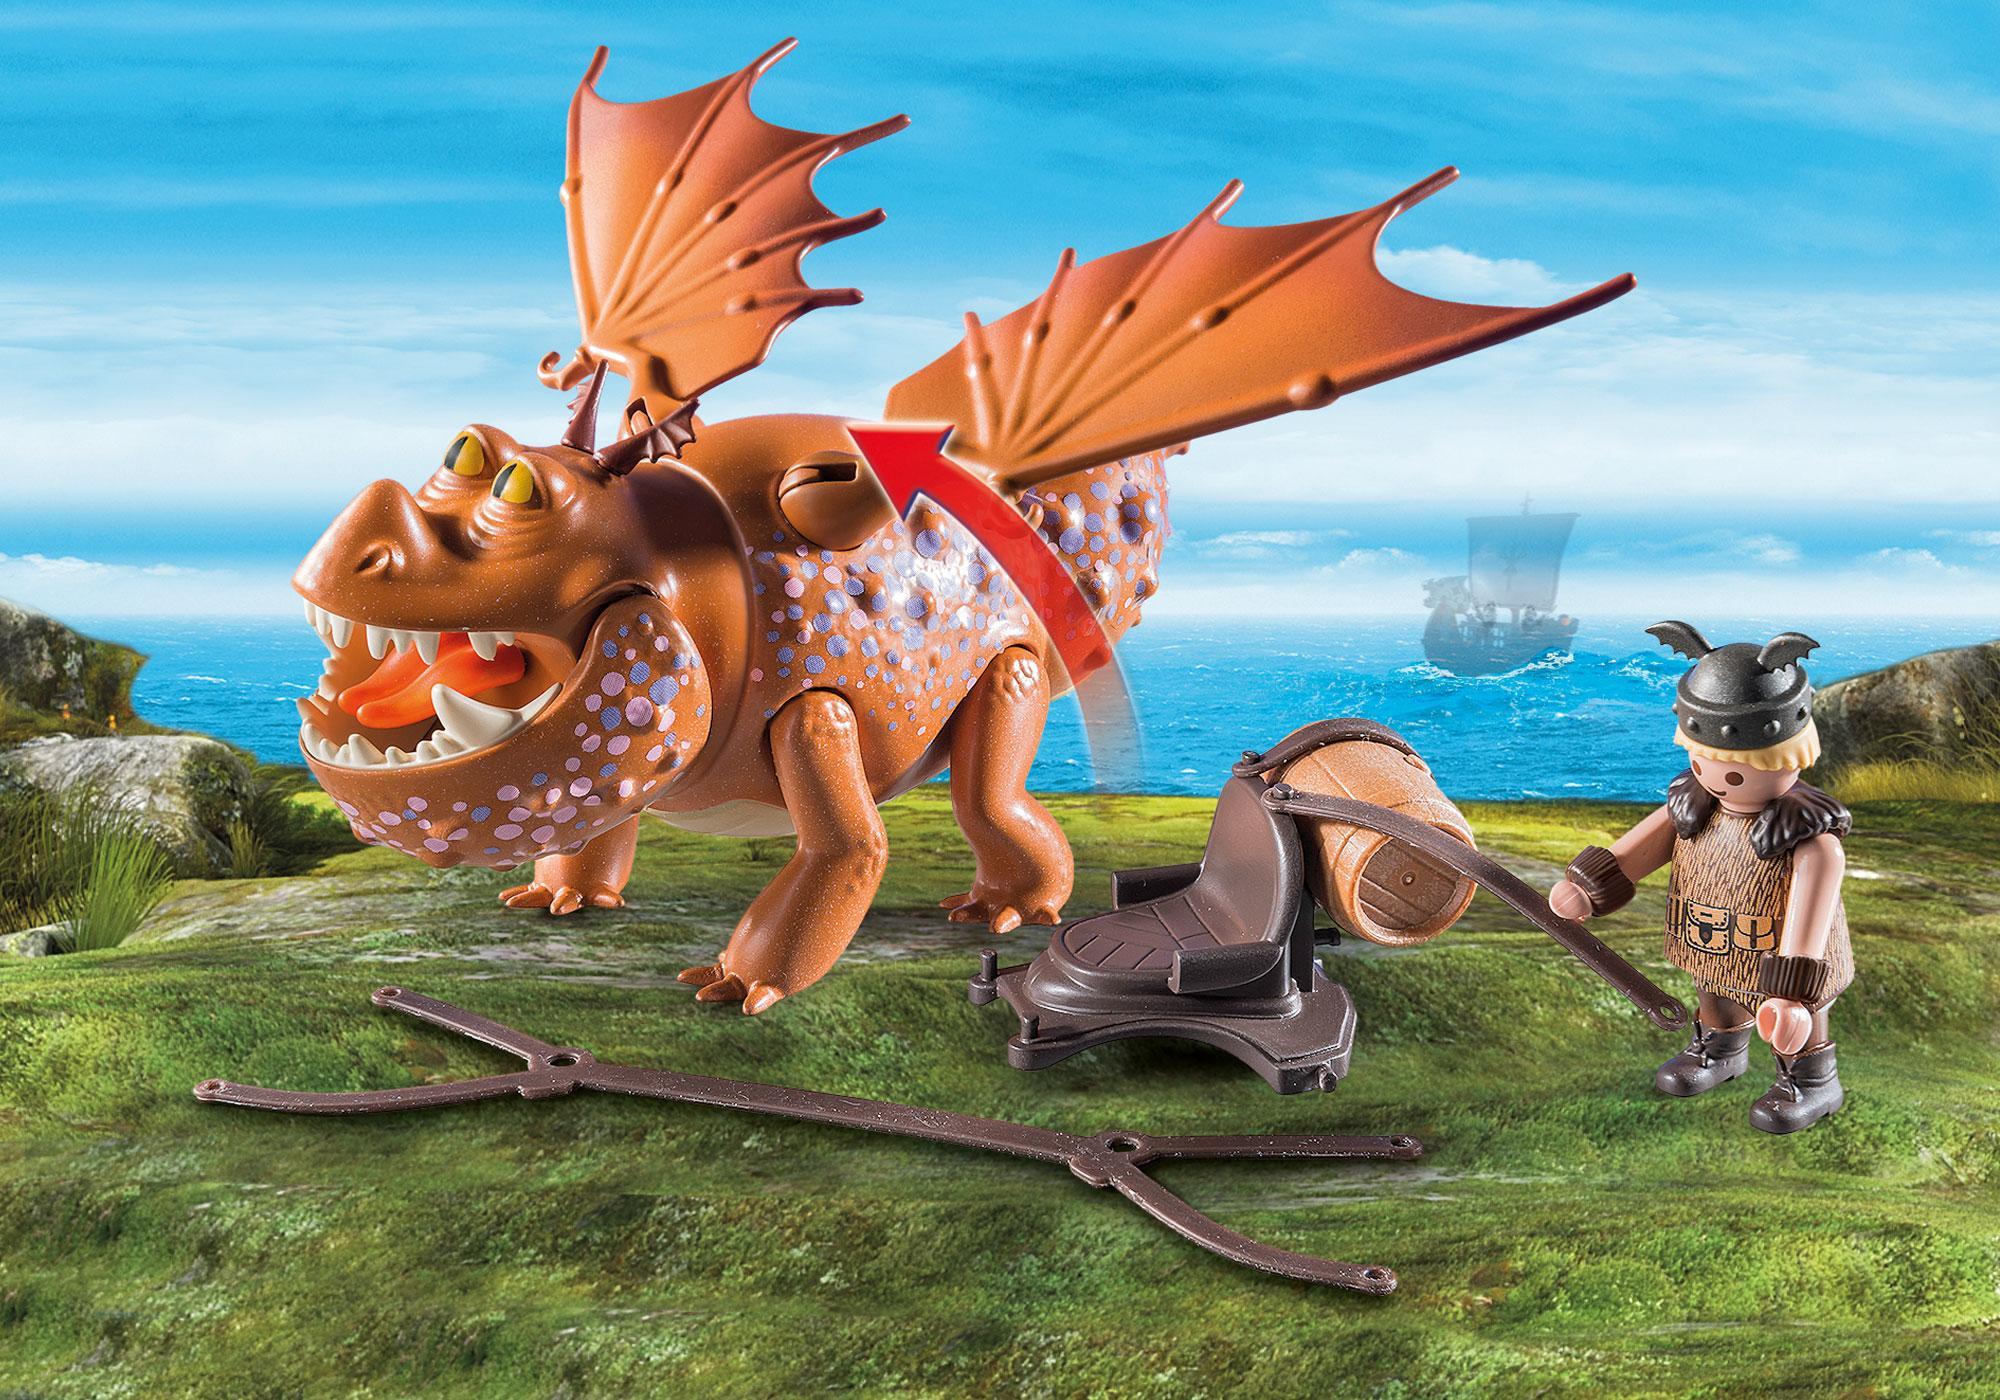 http://media.playmobil.com/i/playmobil/9460_product_extra2/Fishlegs and Meatlug